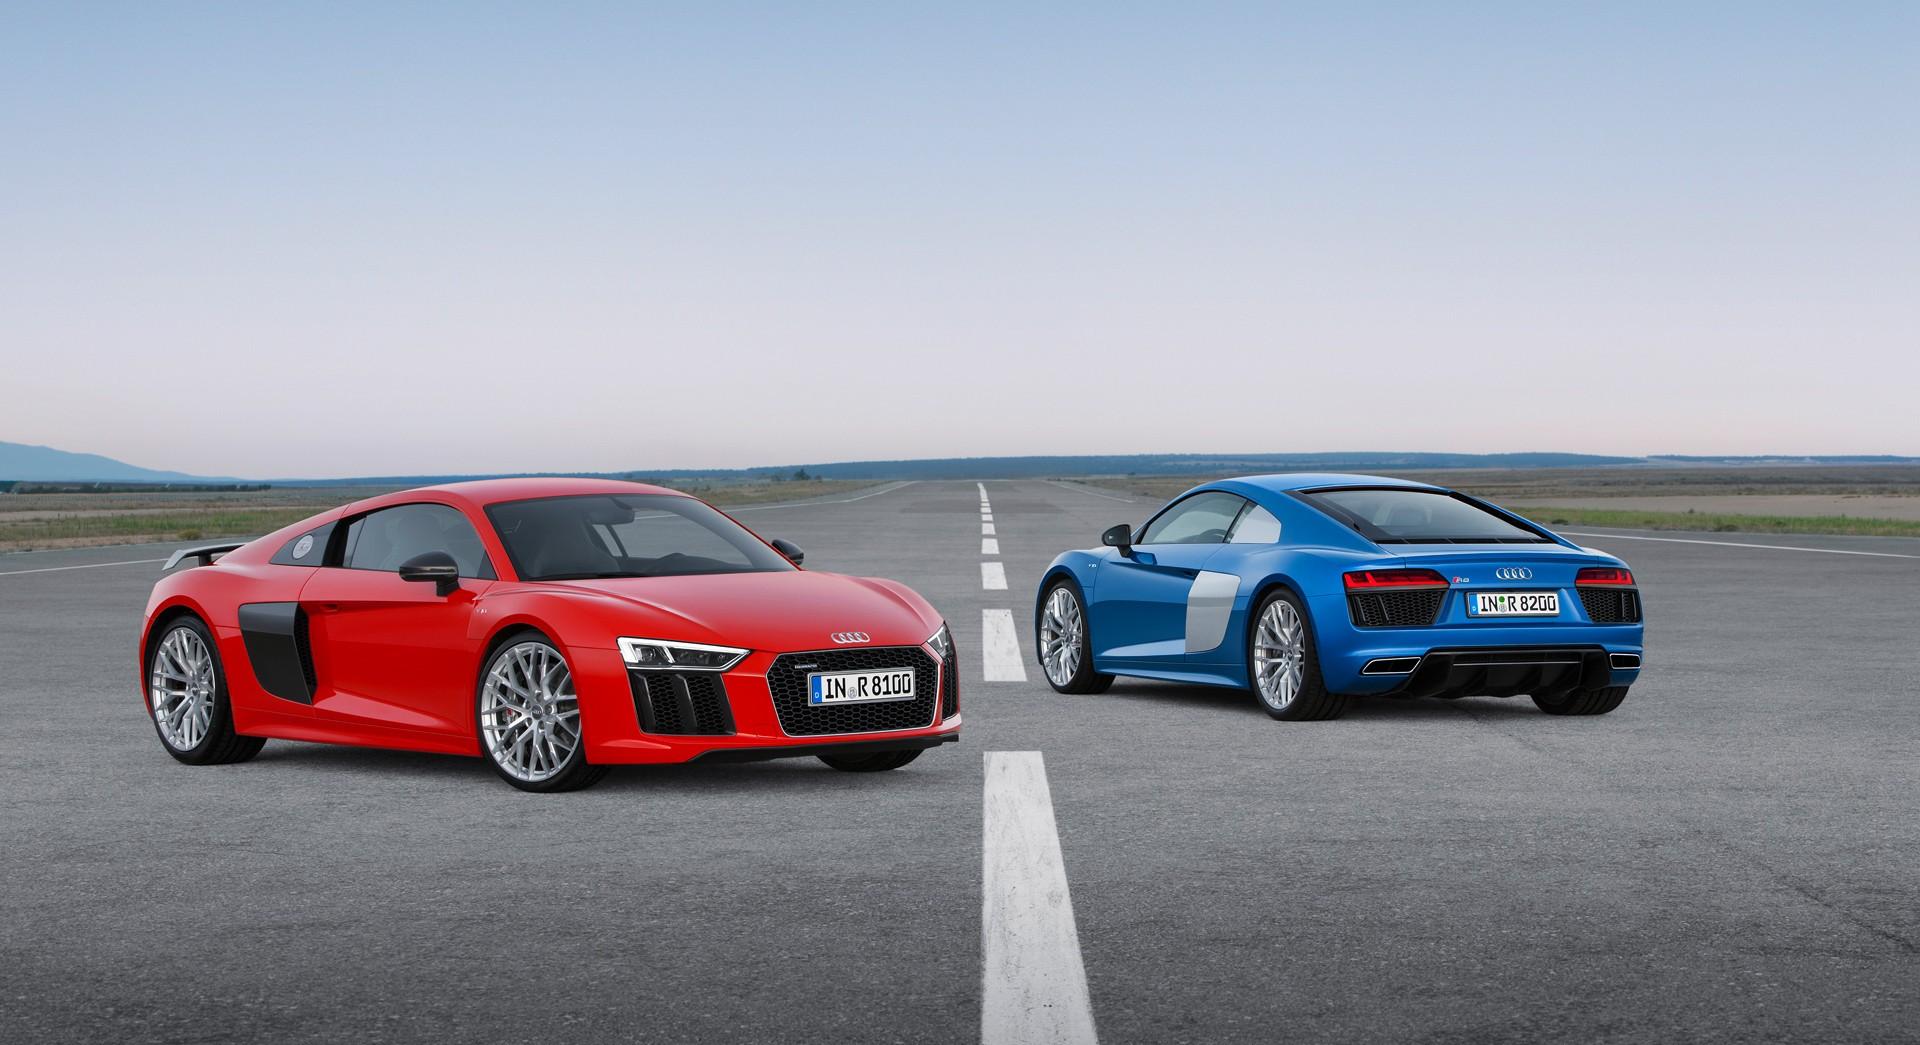 Audi R8 V10 Plus Blue Red Hd Desktop Wallpapers 4k Hd